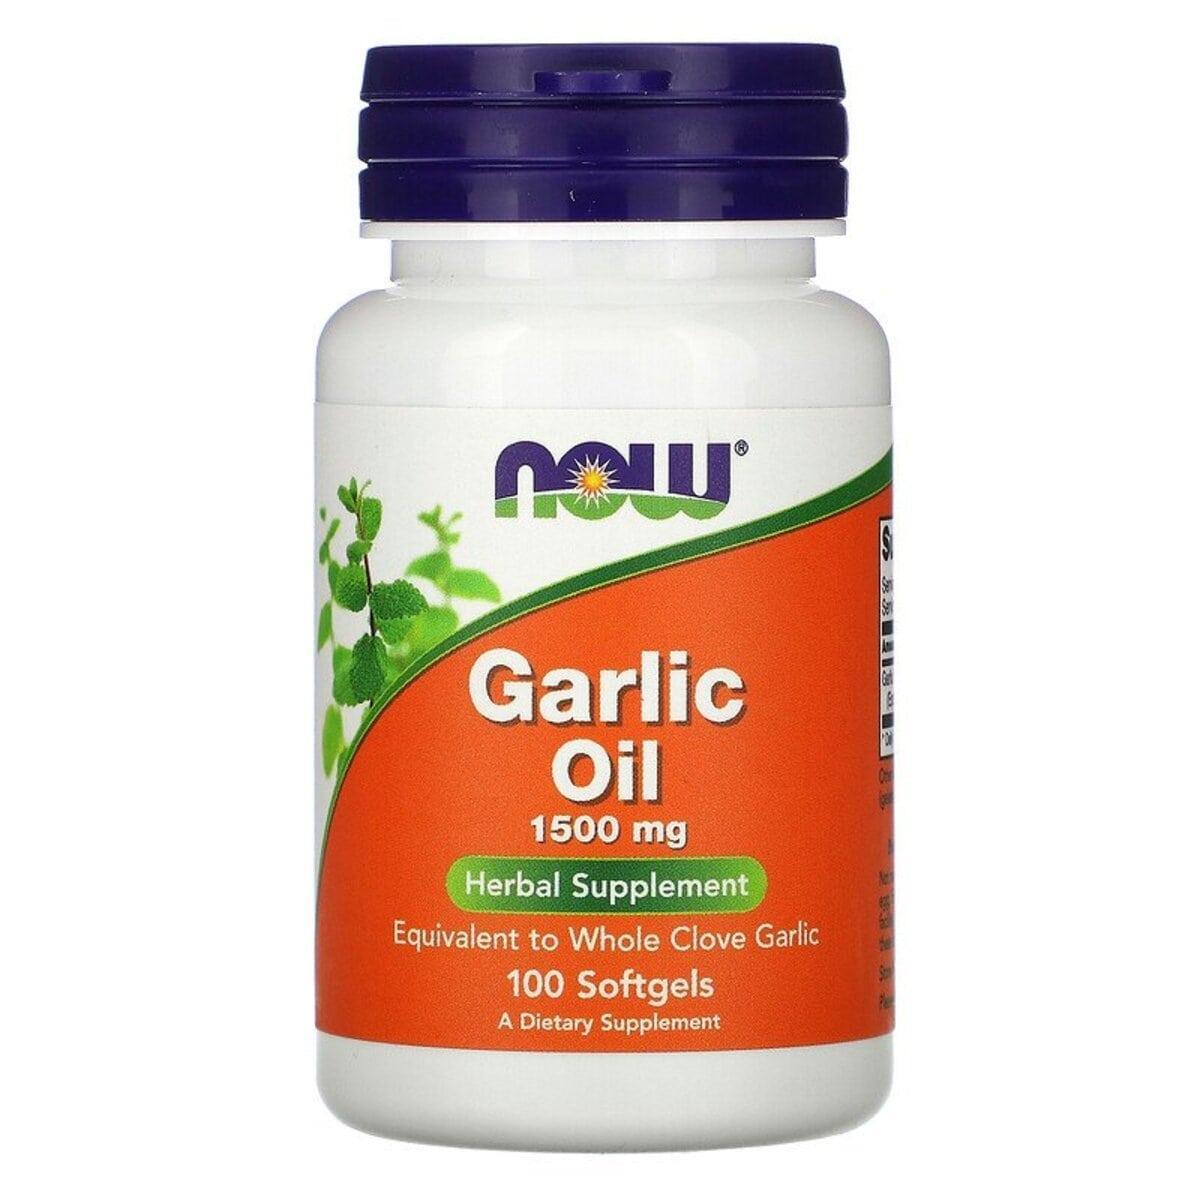 Чесночное масло, 1500 мг, Garlic Oil, Now Foods, 100 гелевых капсул